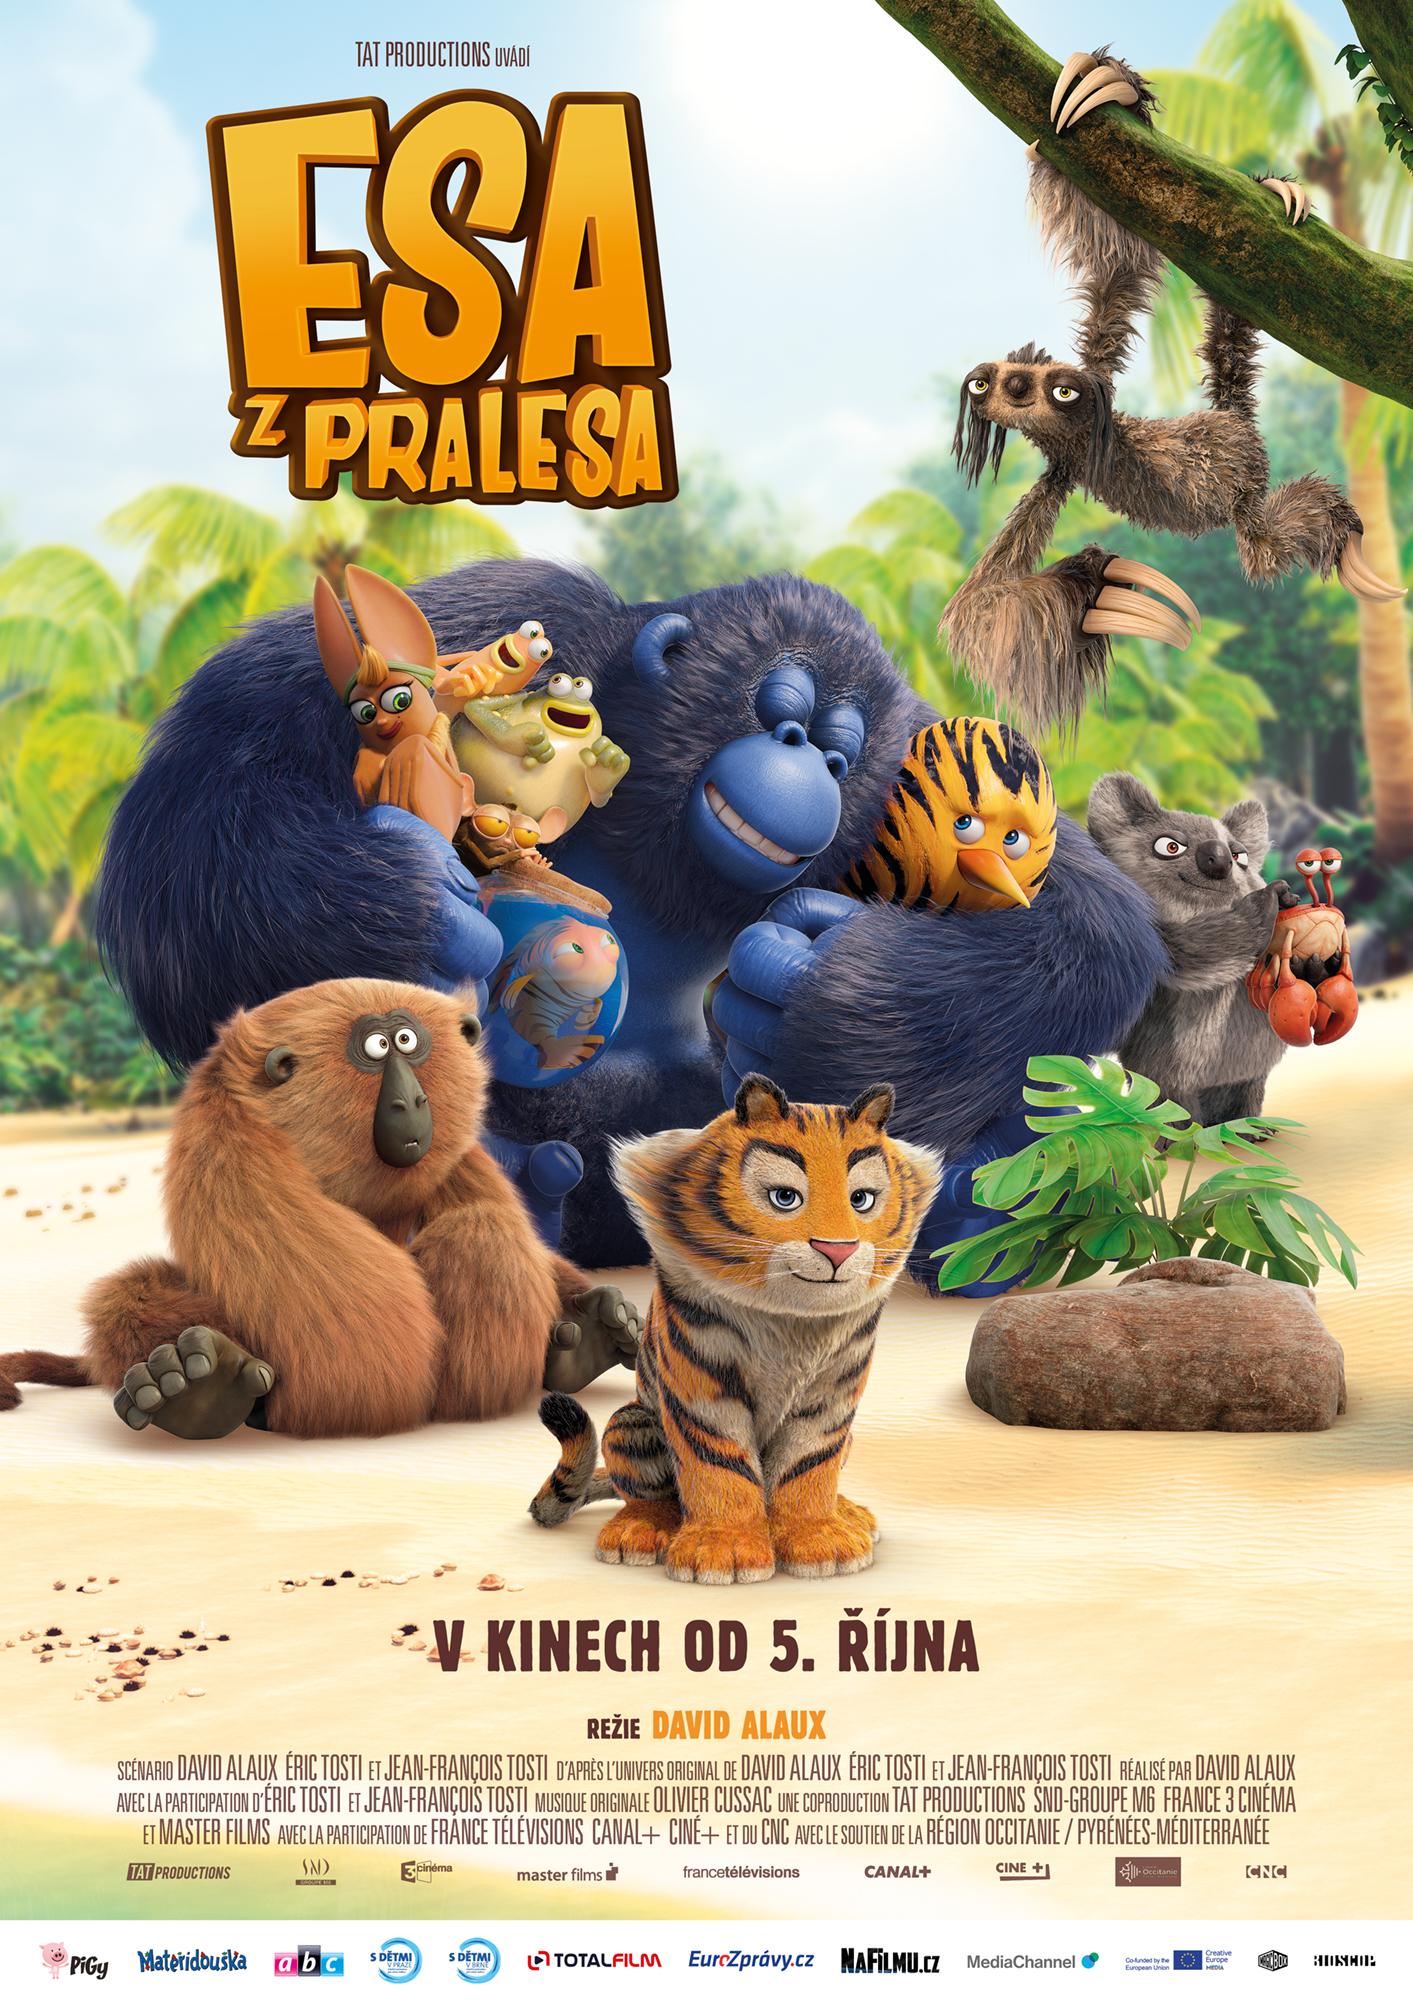 Re: Esa z pralesa / The Jungle Bunch (2017)